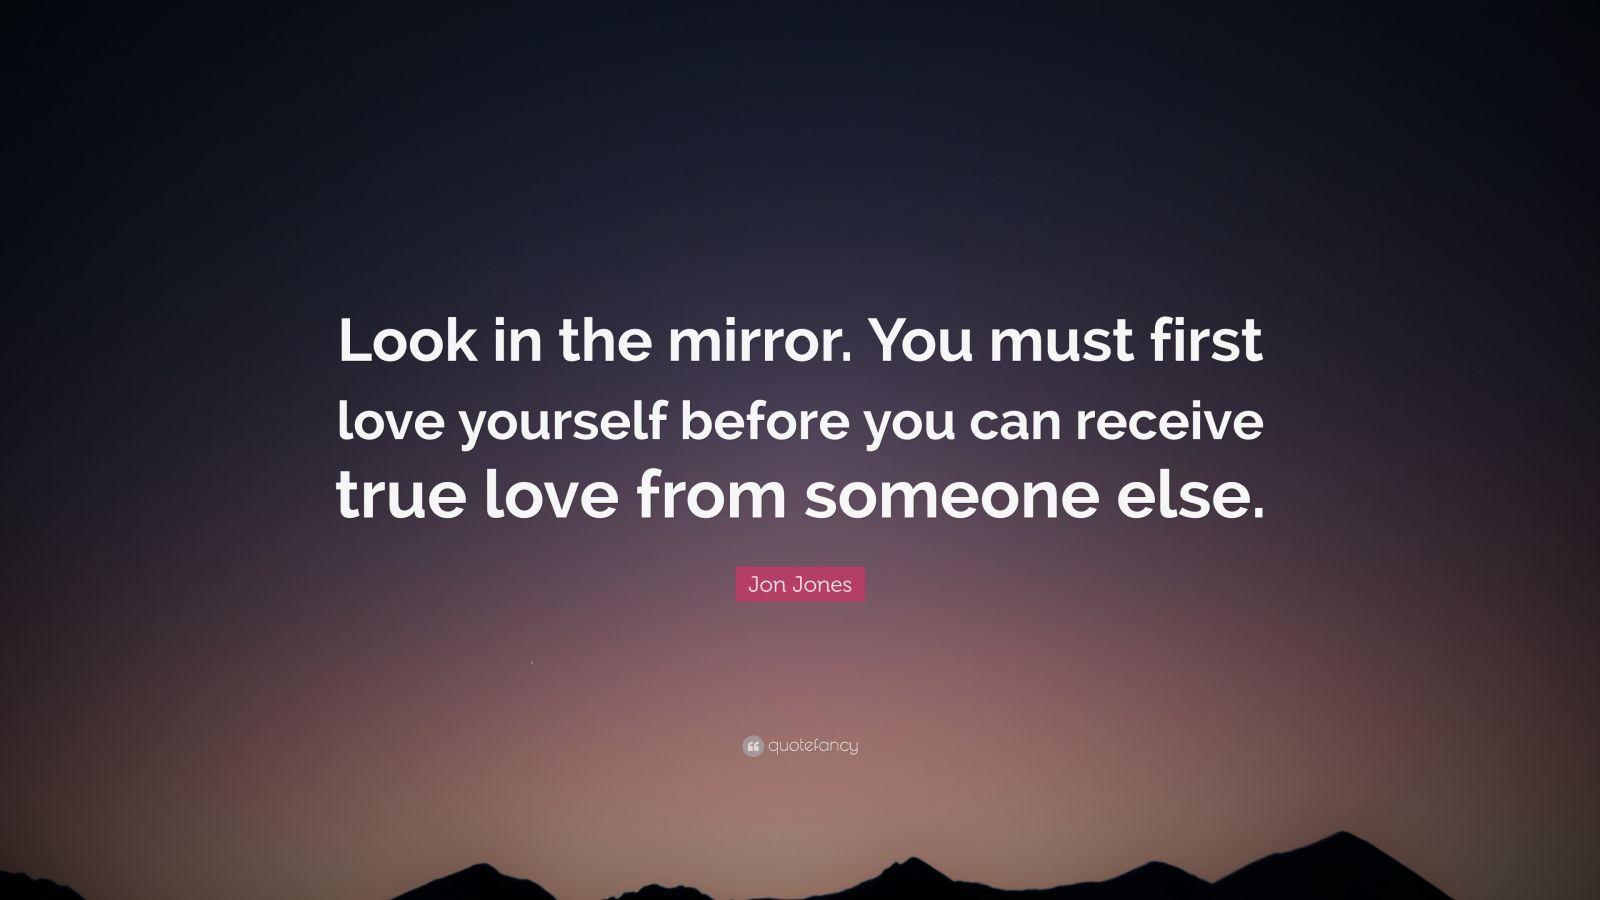 Jon Jones Quote: Look in the mirror. You must first love